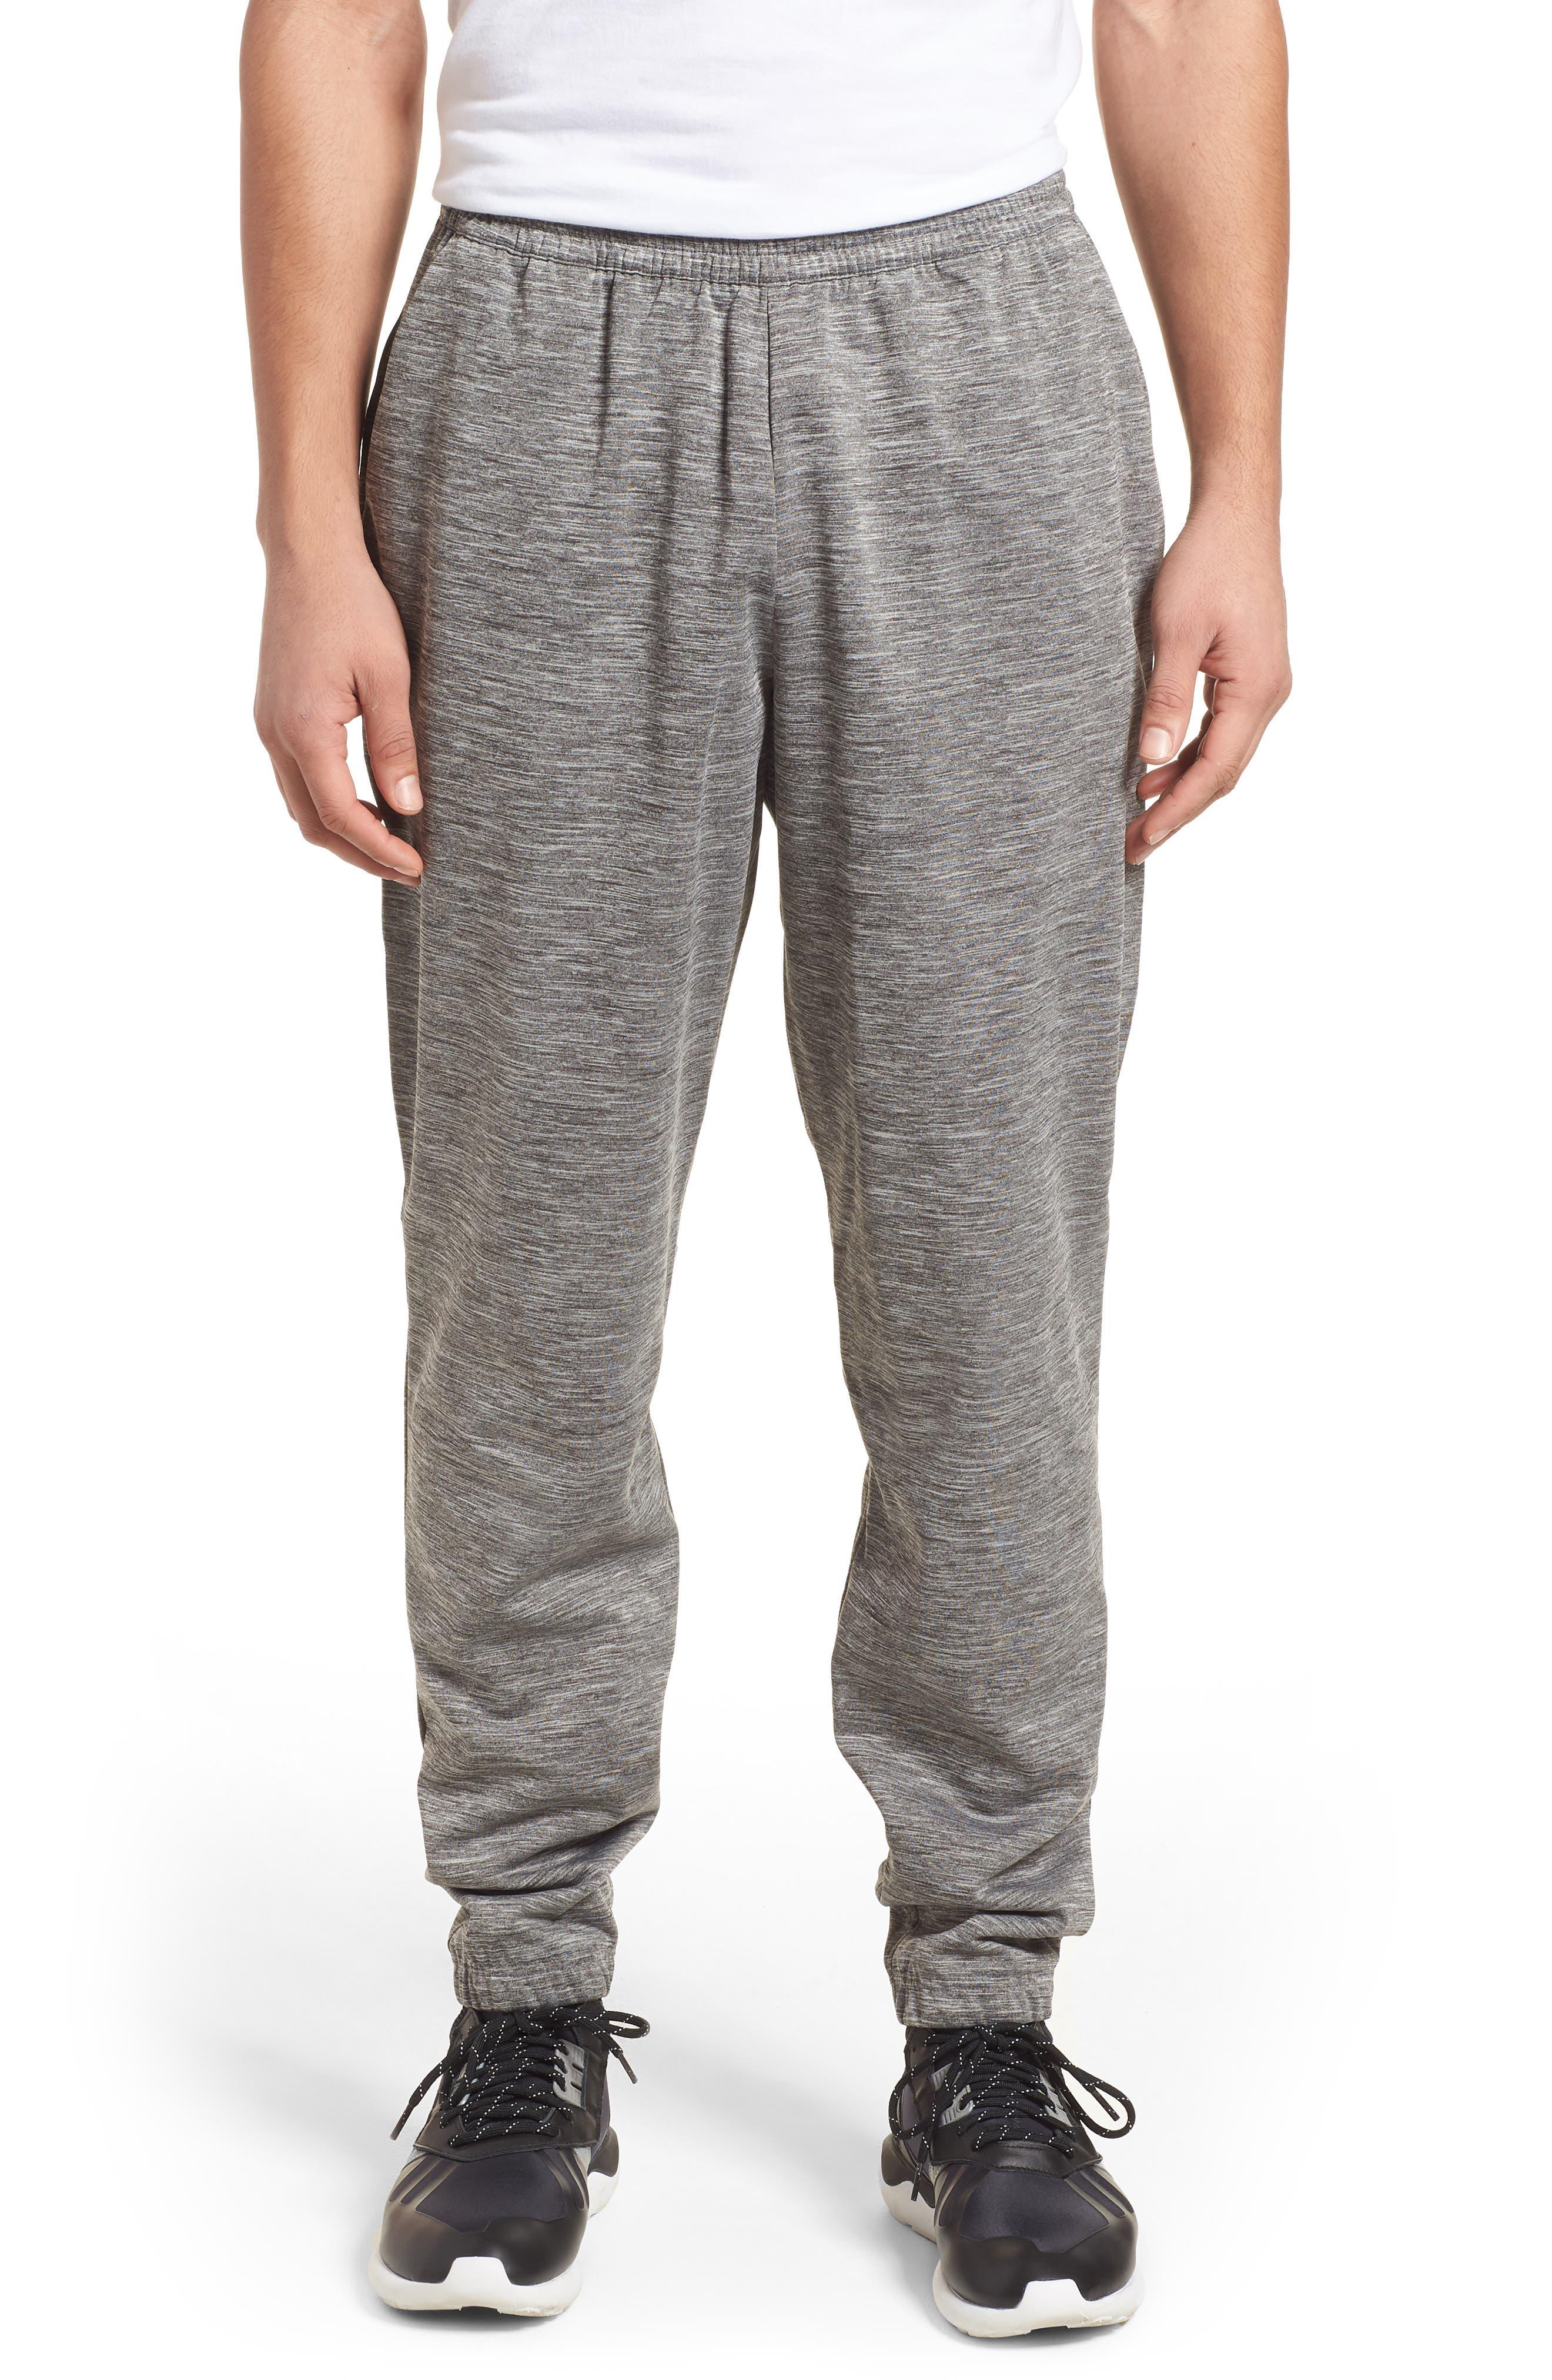 Z.N.E. Lounge Pants,                         Main,                         color, Black / Storm Heather/ Mgh